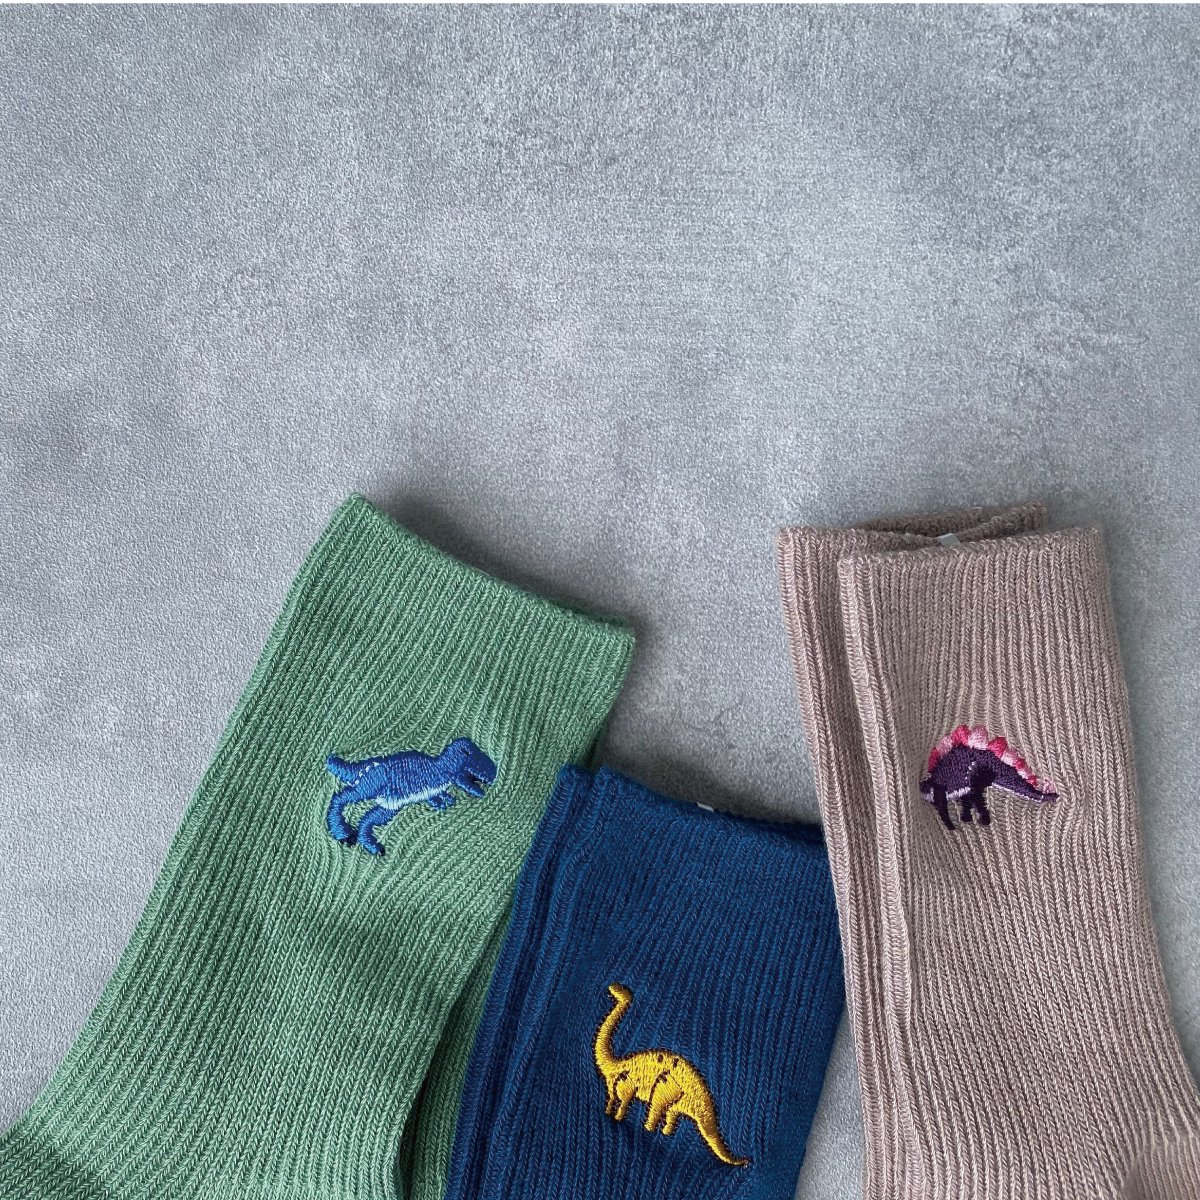 【KIDS】Dino Socks 詳細画像16